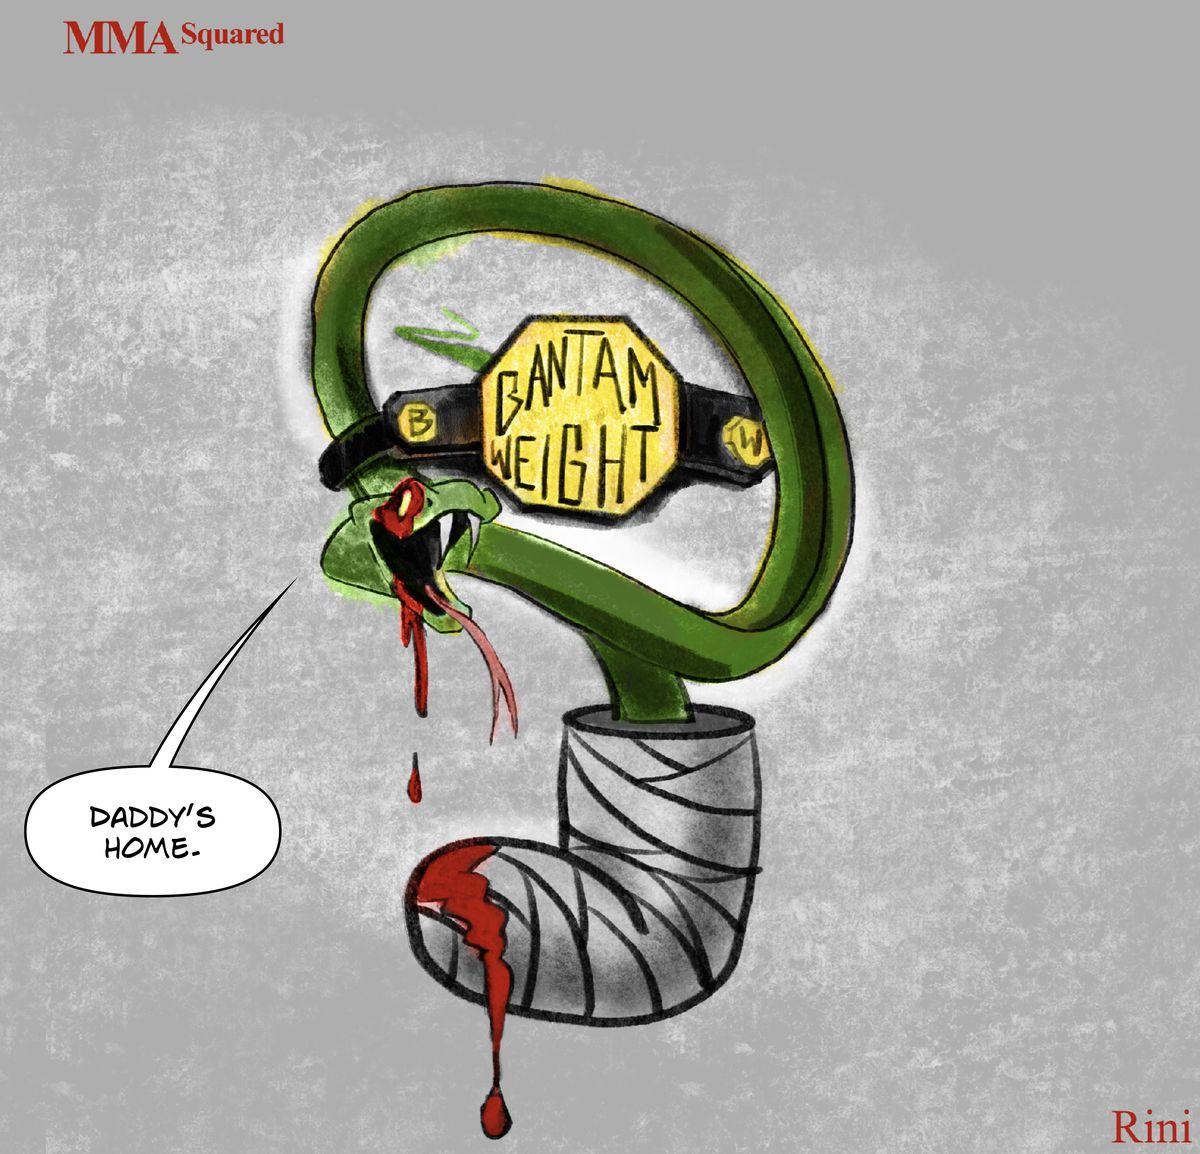 MMA Squared, Chris Rini, TJ Dillashaw, Cory Sandhagen, Las Vegas, Fight Night, Bantamweight, Petr Yan, Aljamain Sterling, UFC, MMA